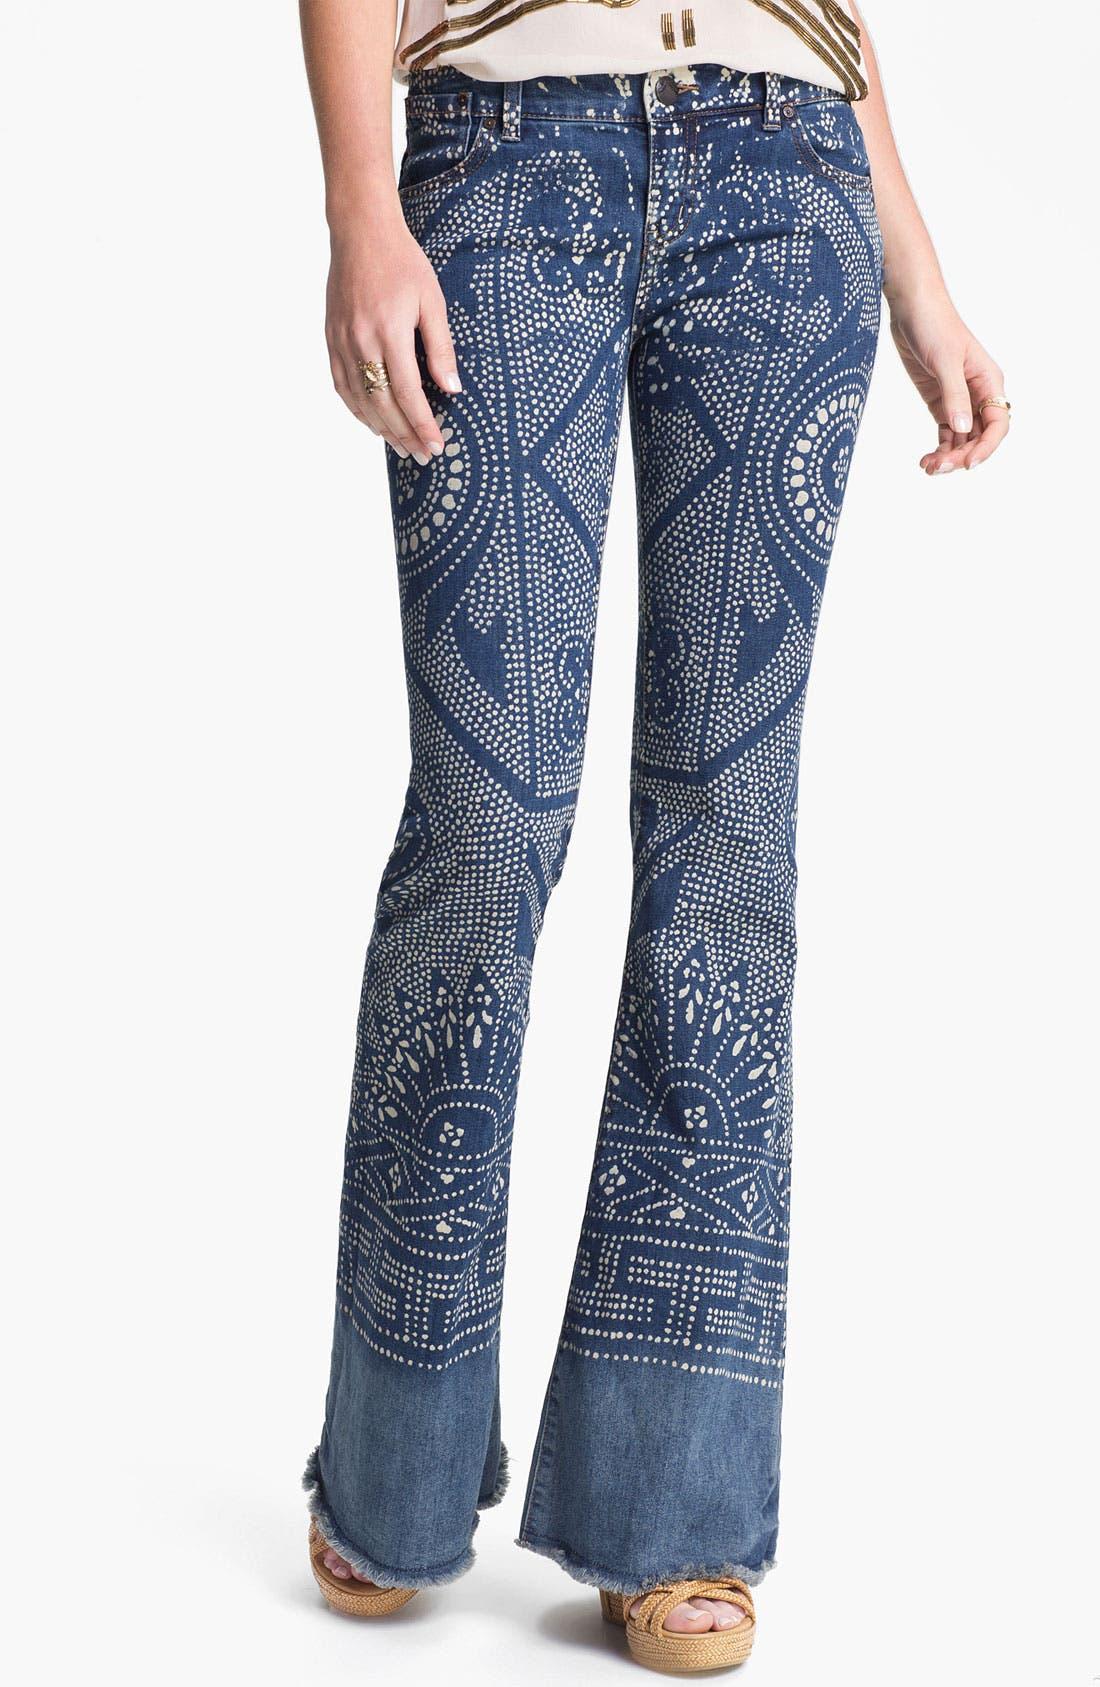 Alternate Image 1 Selected - Free People 'Bali' Print Flare Leg Jeans (Malaya)